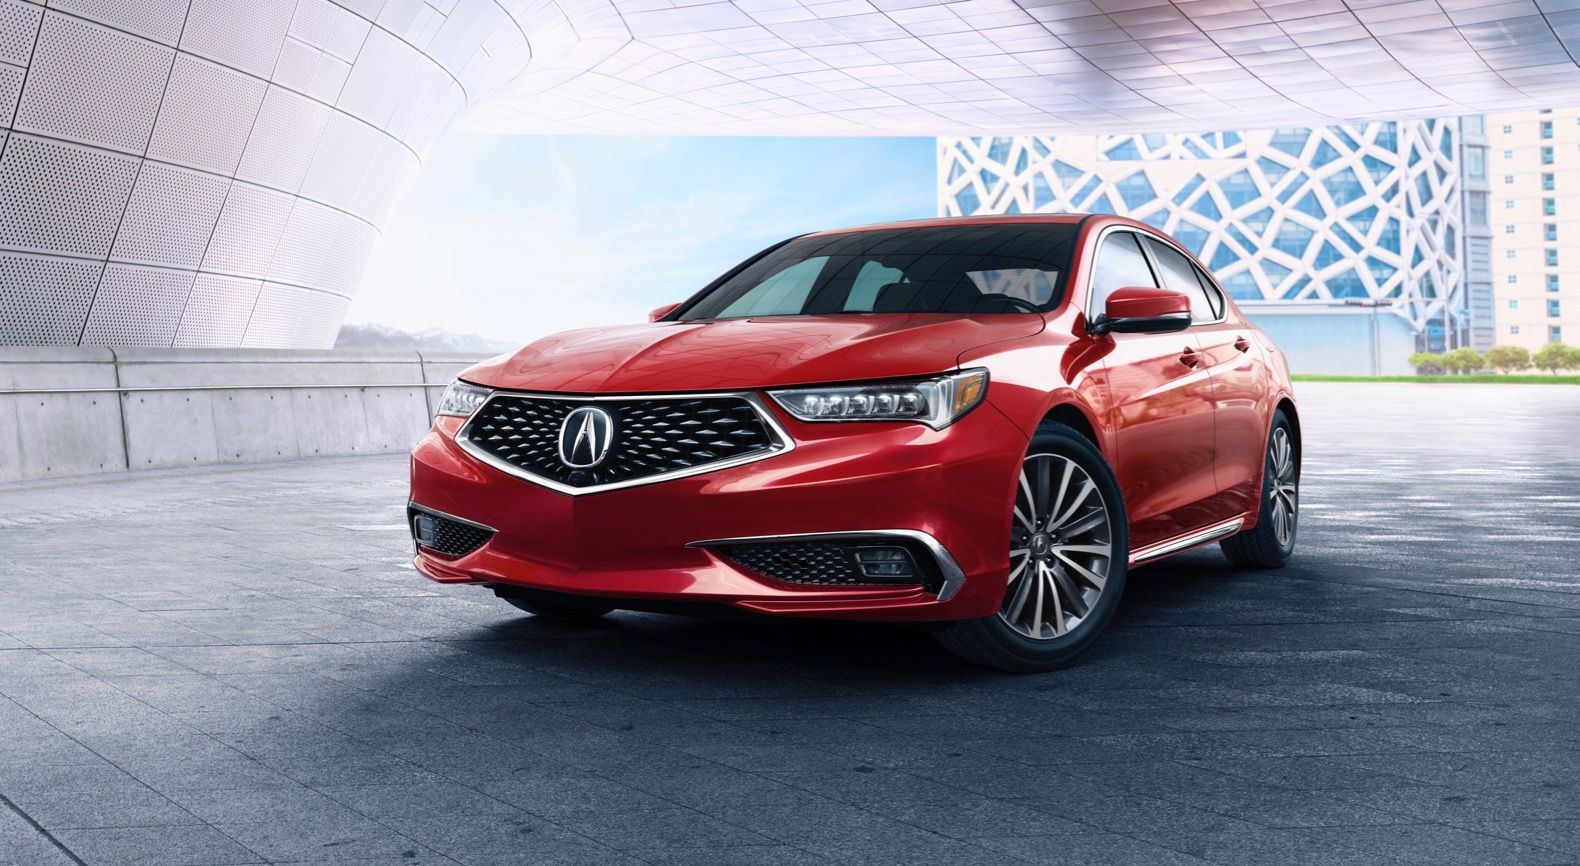 2018 Acura Tlx Introduces New Aspec Model The Torque Report